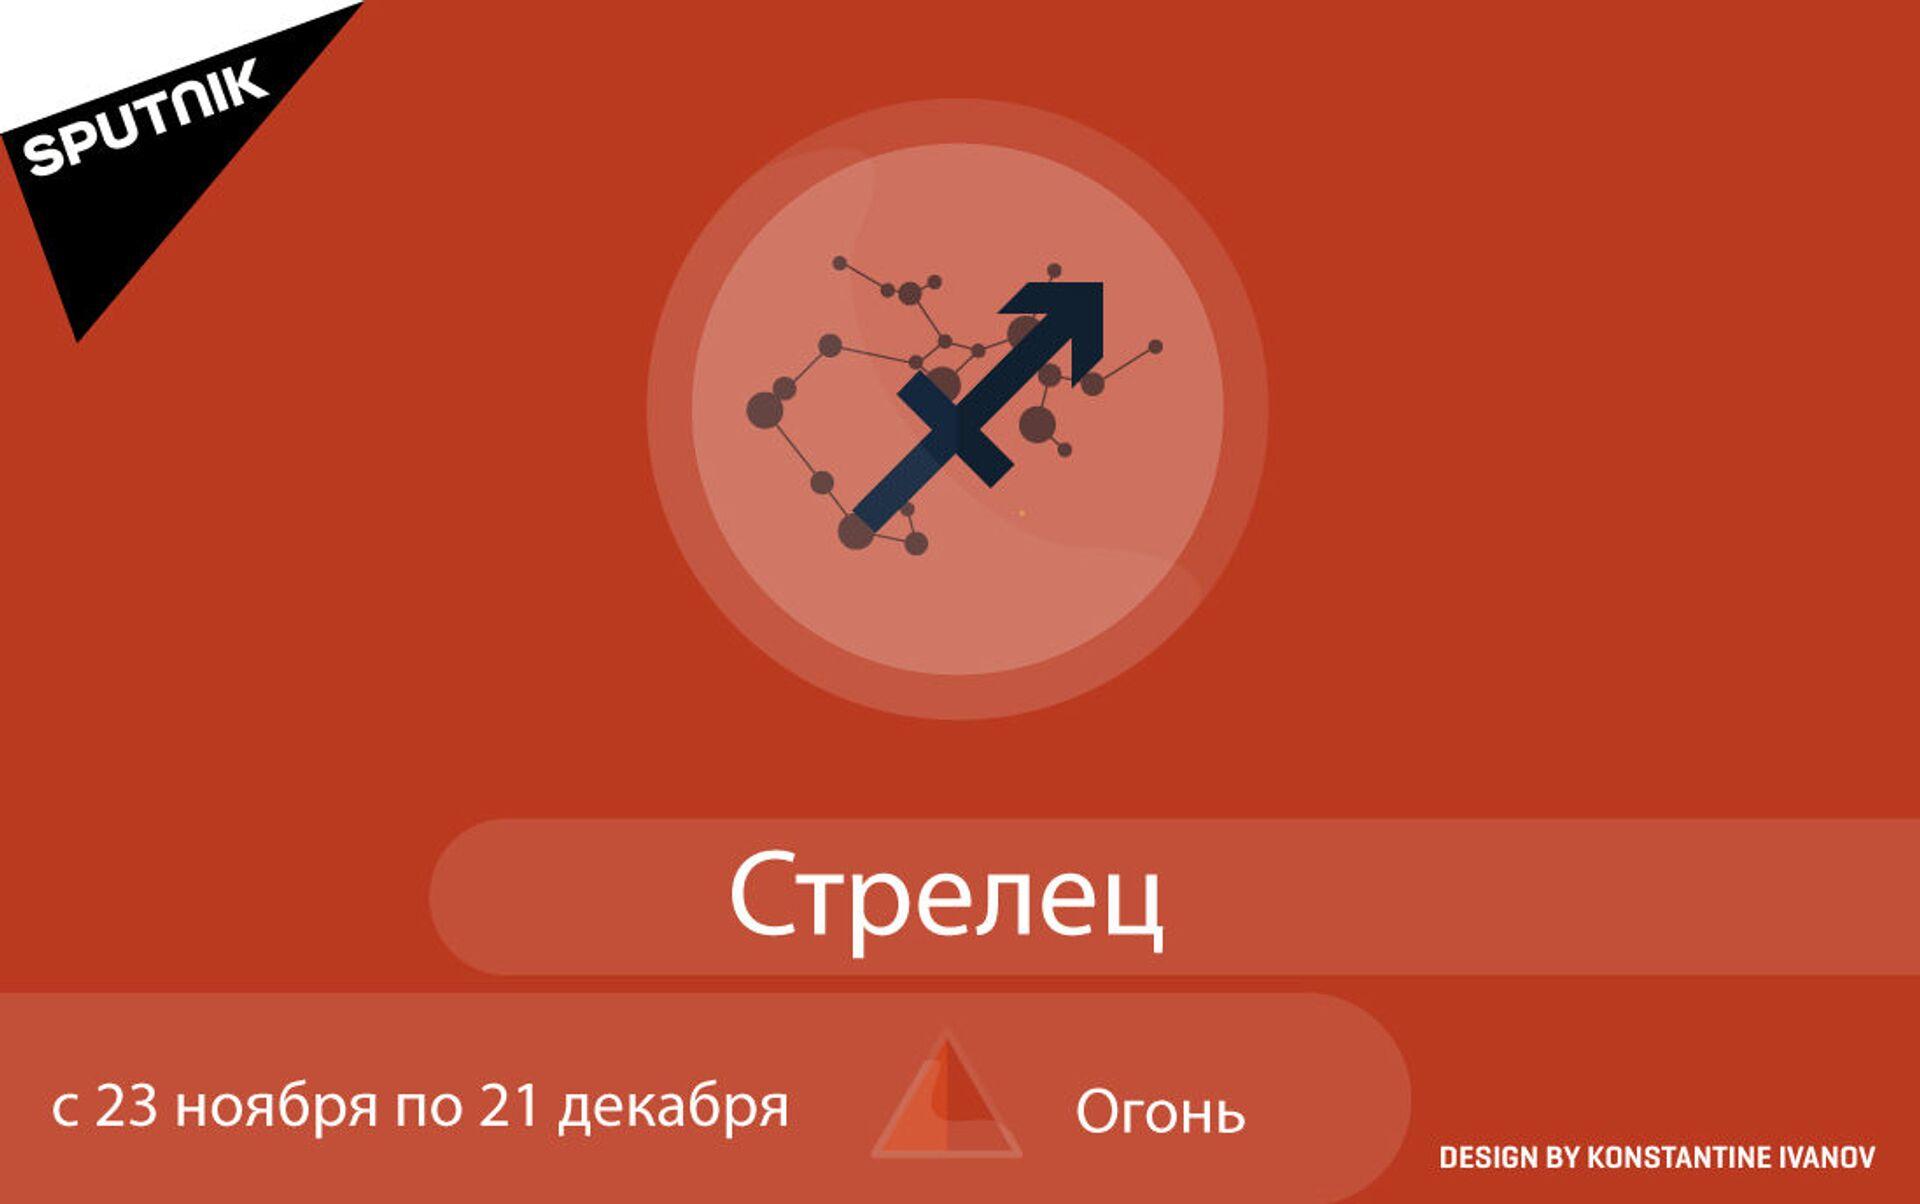 Стрелец - Sputnik Грузия, 1920, 11.09.2021